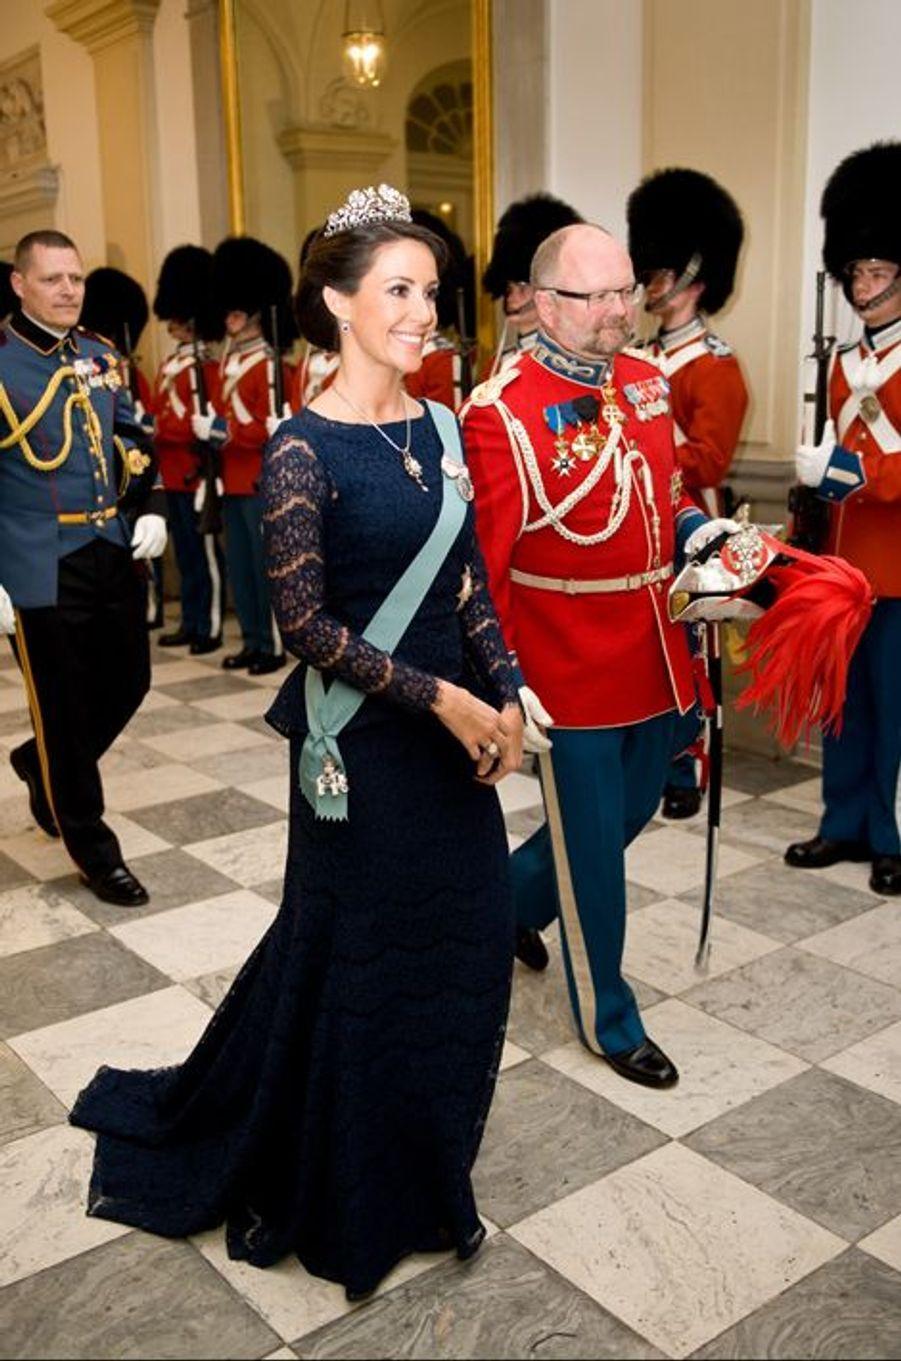 La princesse Marie de Danemark, le 15 avril 2015